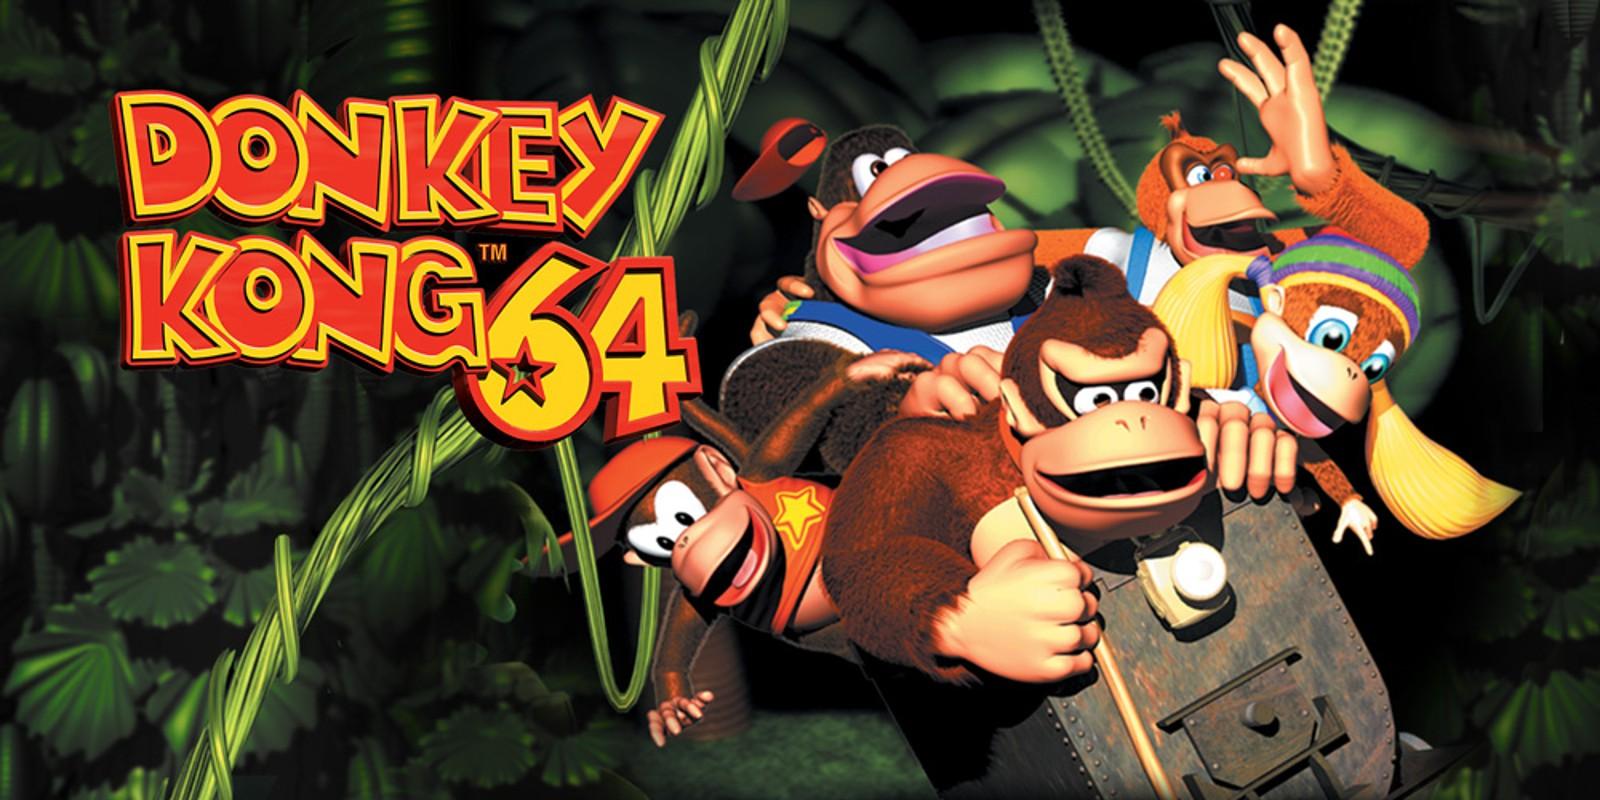 Donkey Kong 64-top melhor jogo de aventura do n64-best game 64